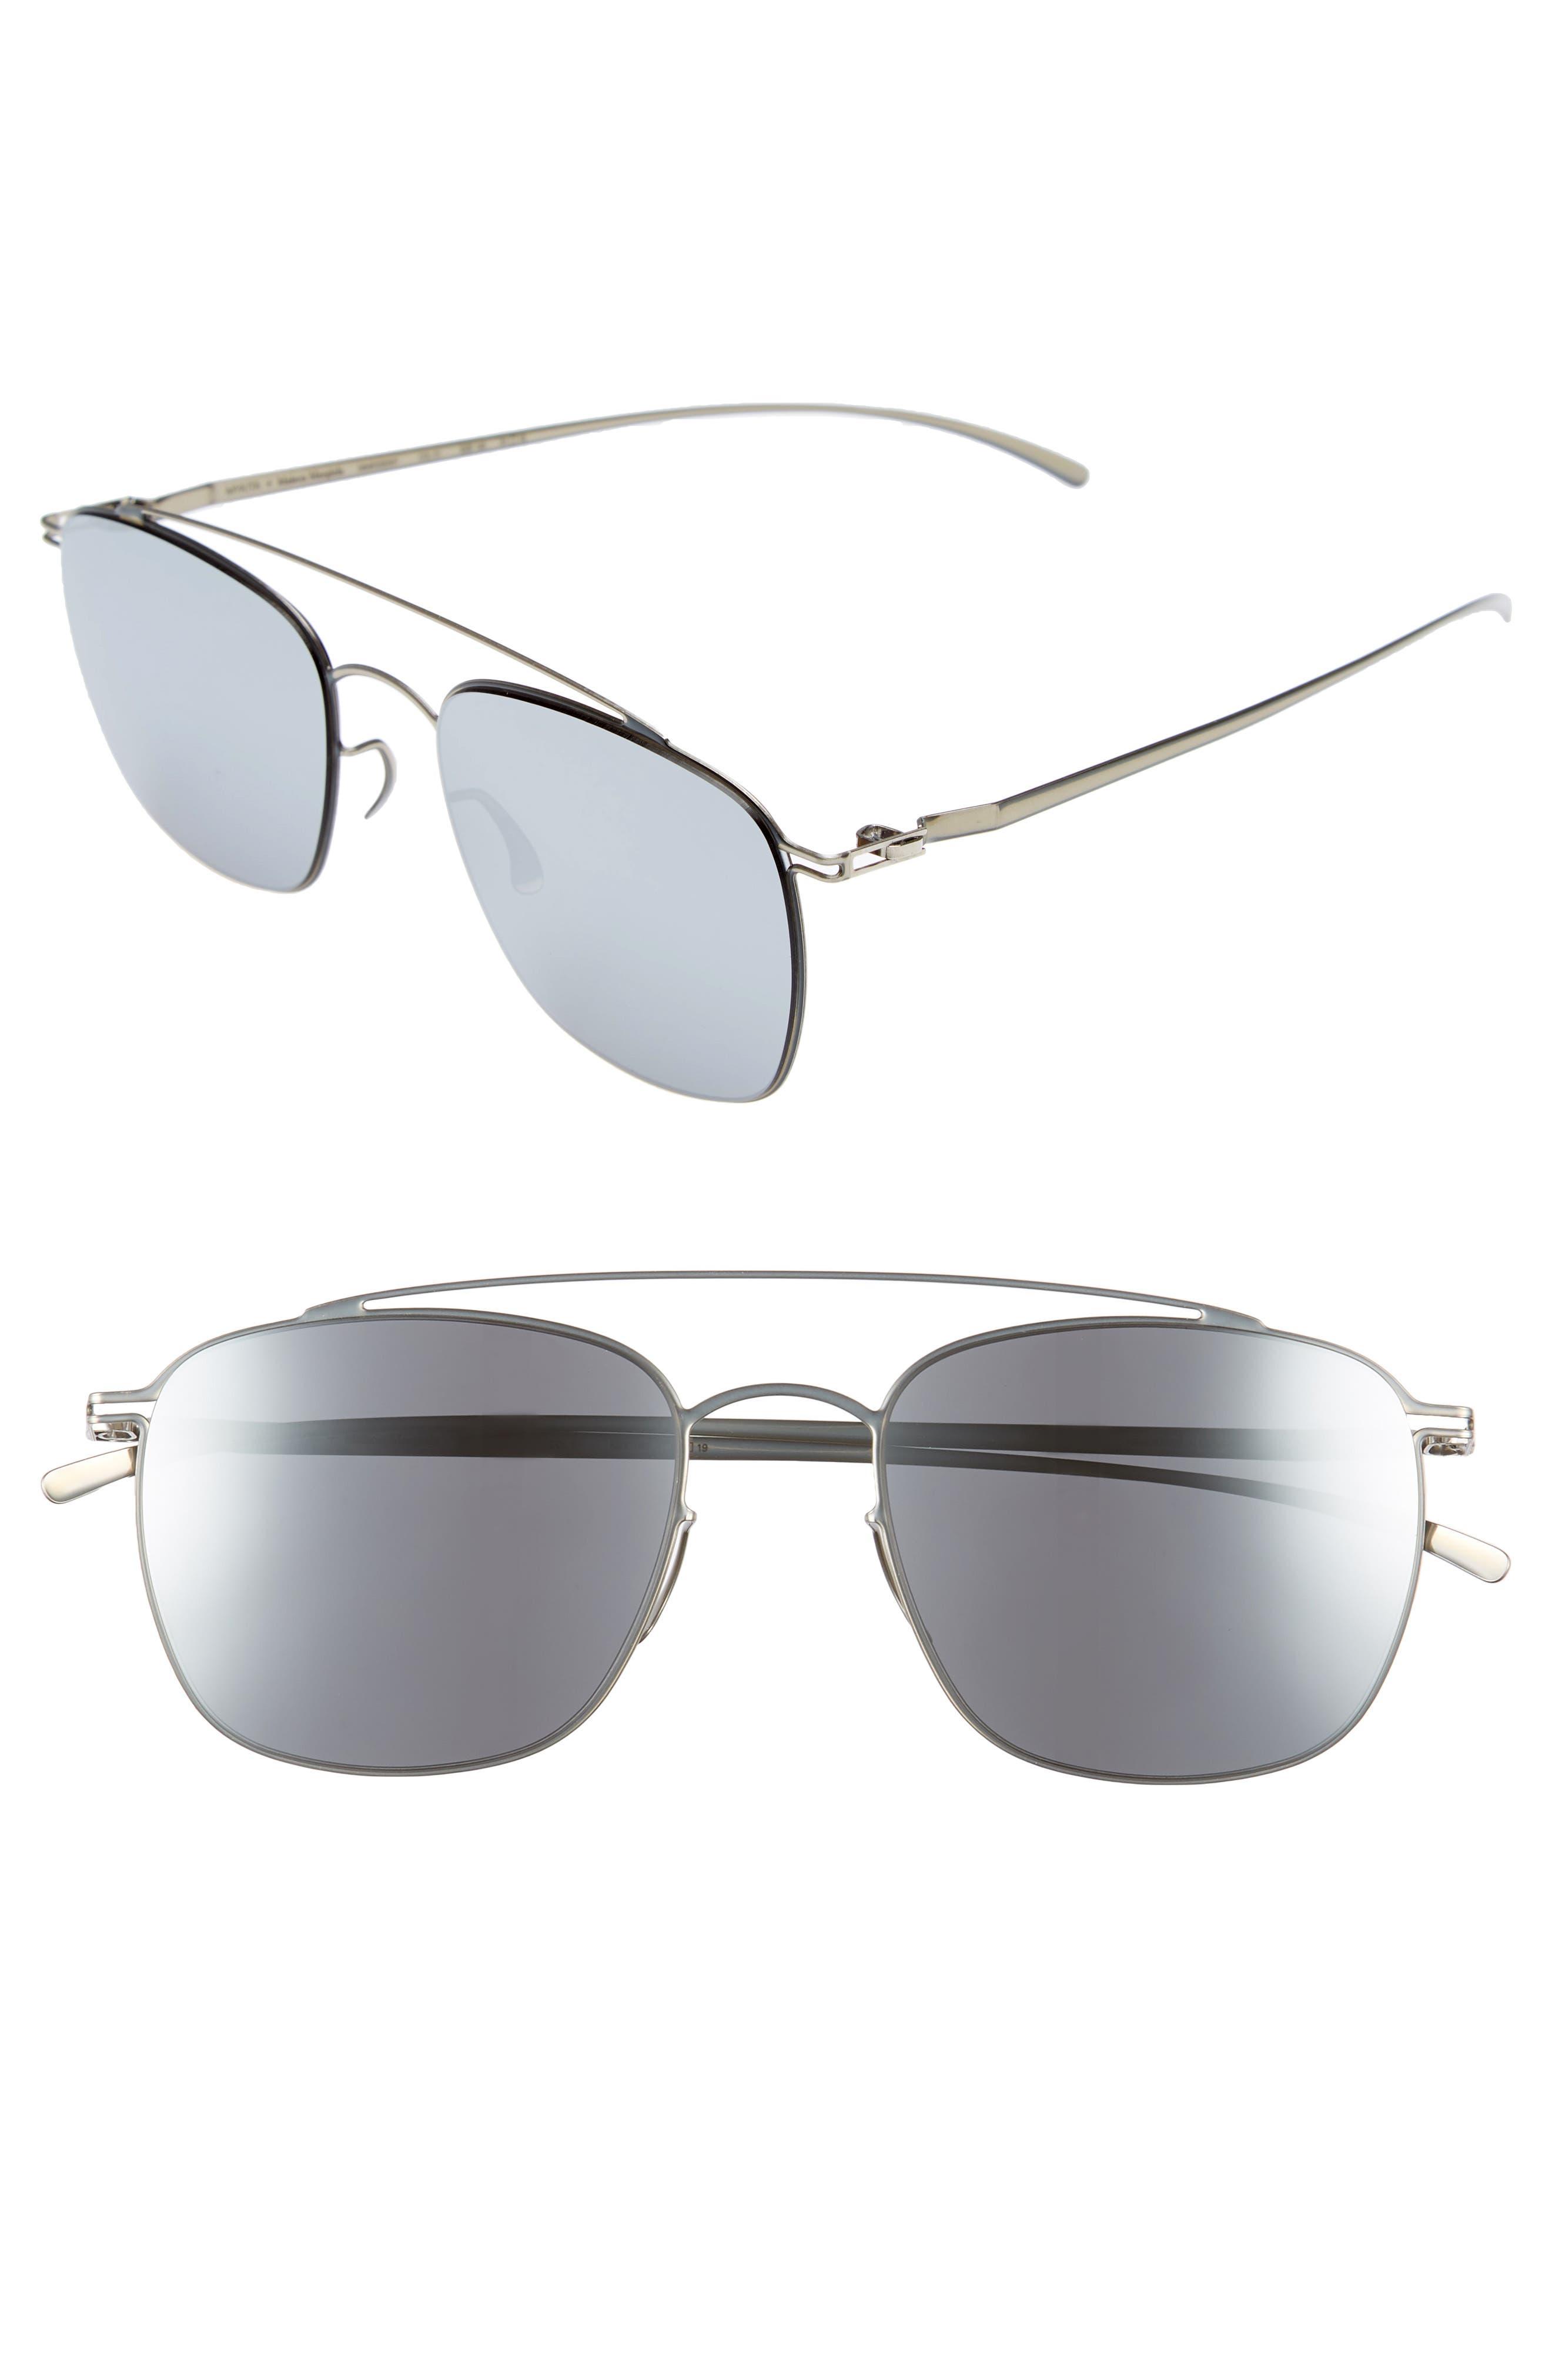 MMESSE007 51mm Aviator Sunglasses,                             Main thumbnail 2, color,